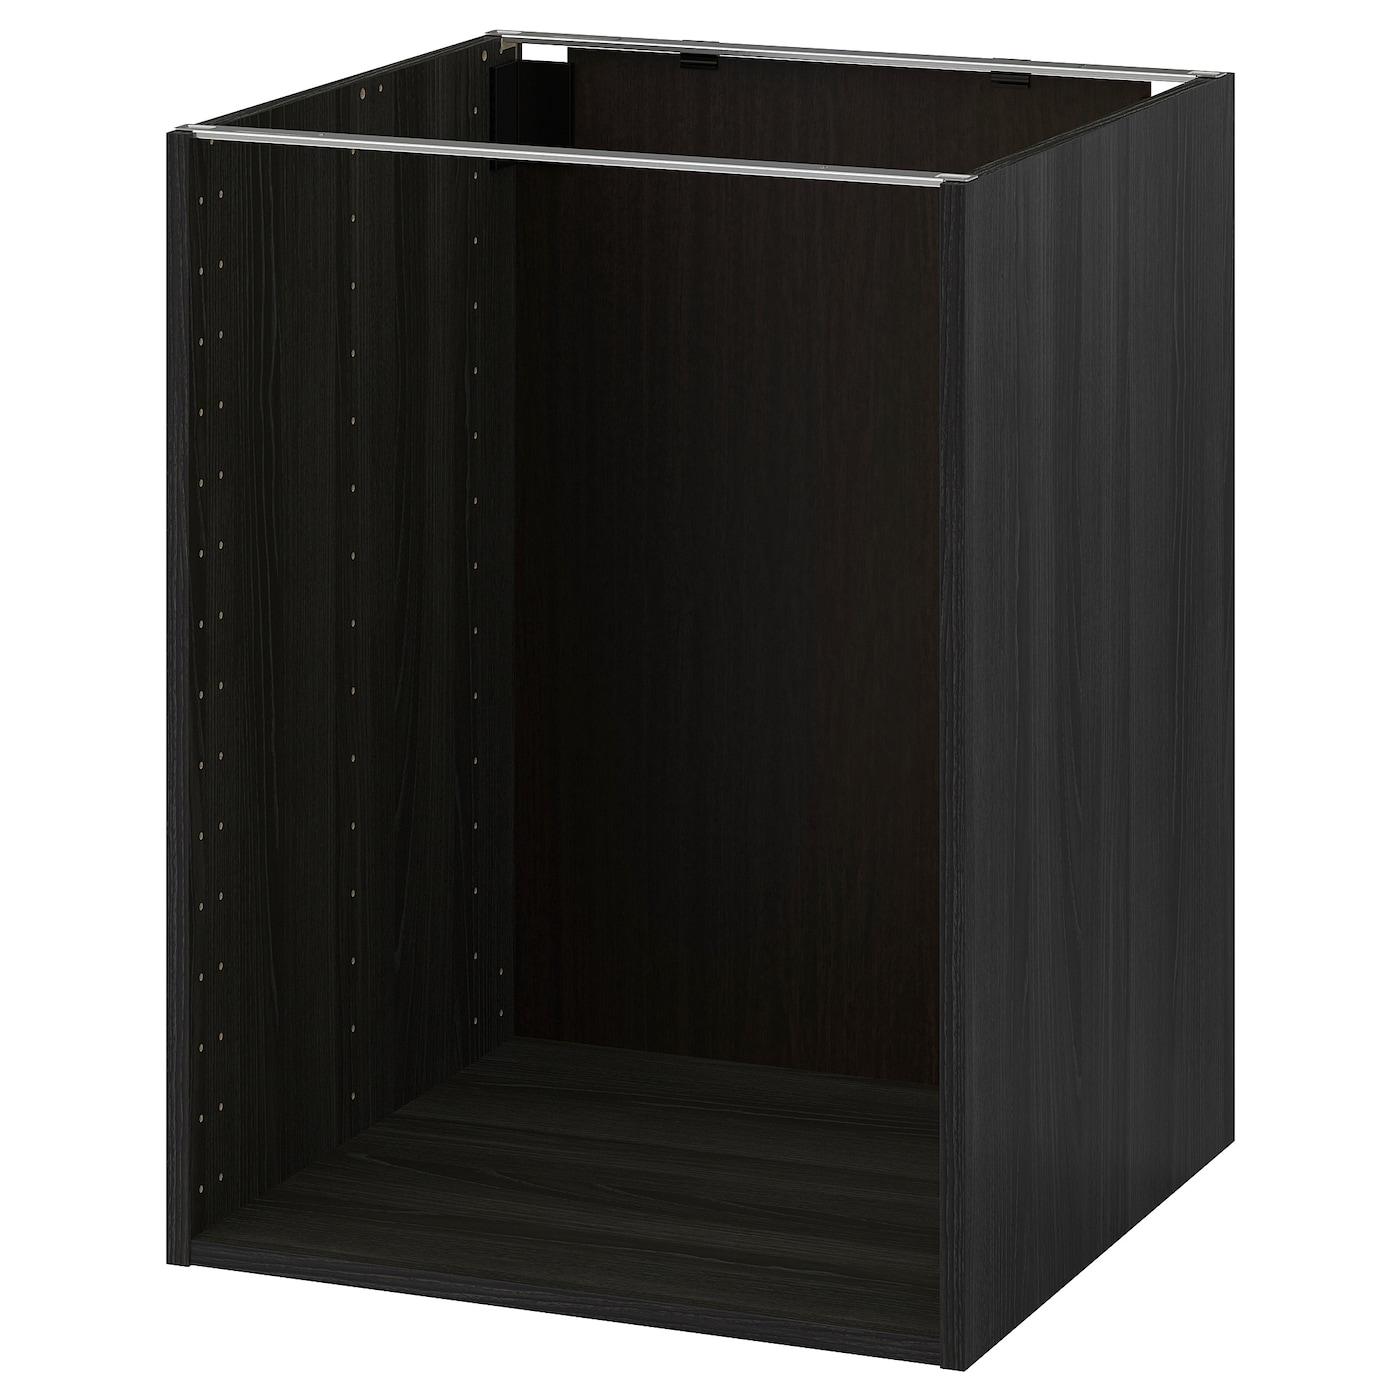 METOD Base Cabinet Frame Wood Effect Black 60 X 60 X 80 Cm